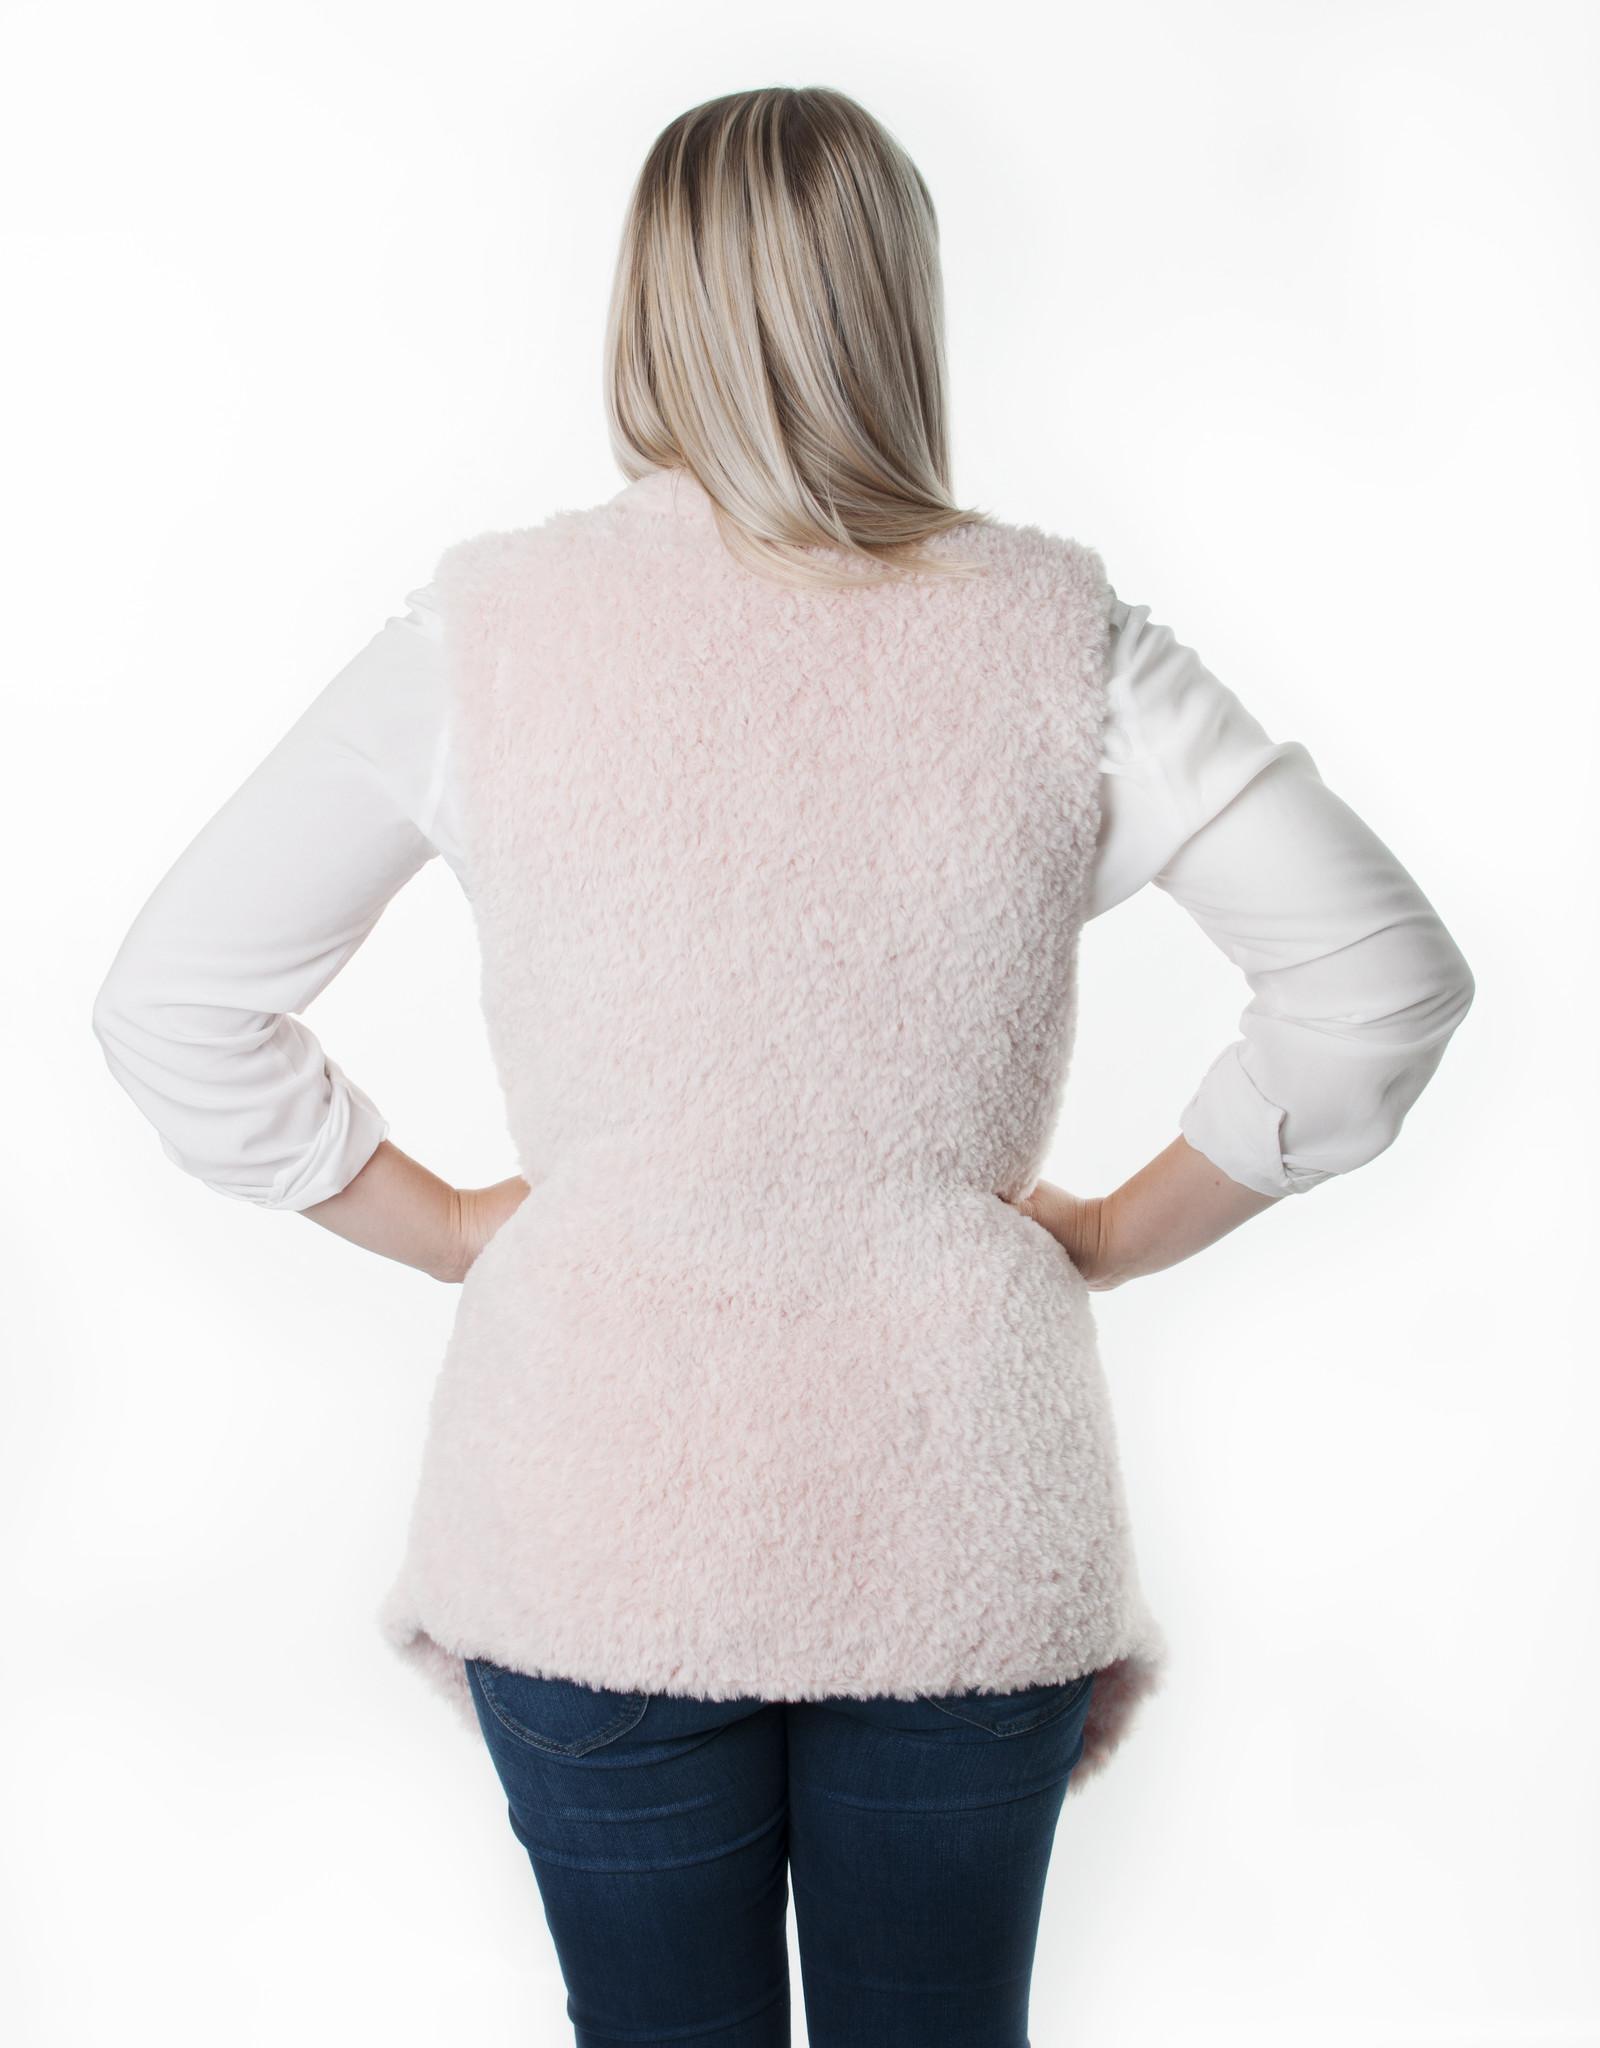 Angels-Knit by FDF 100% handmade Softy